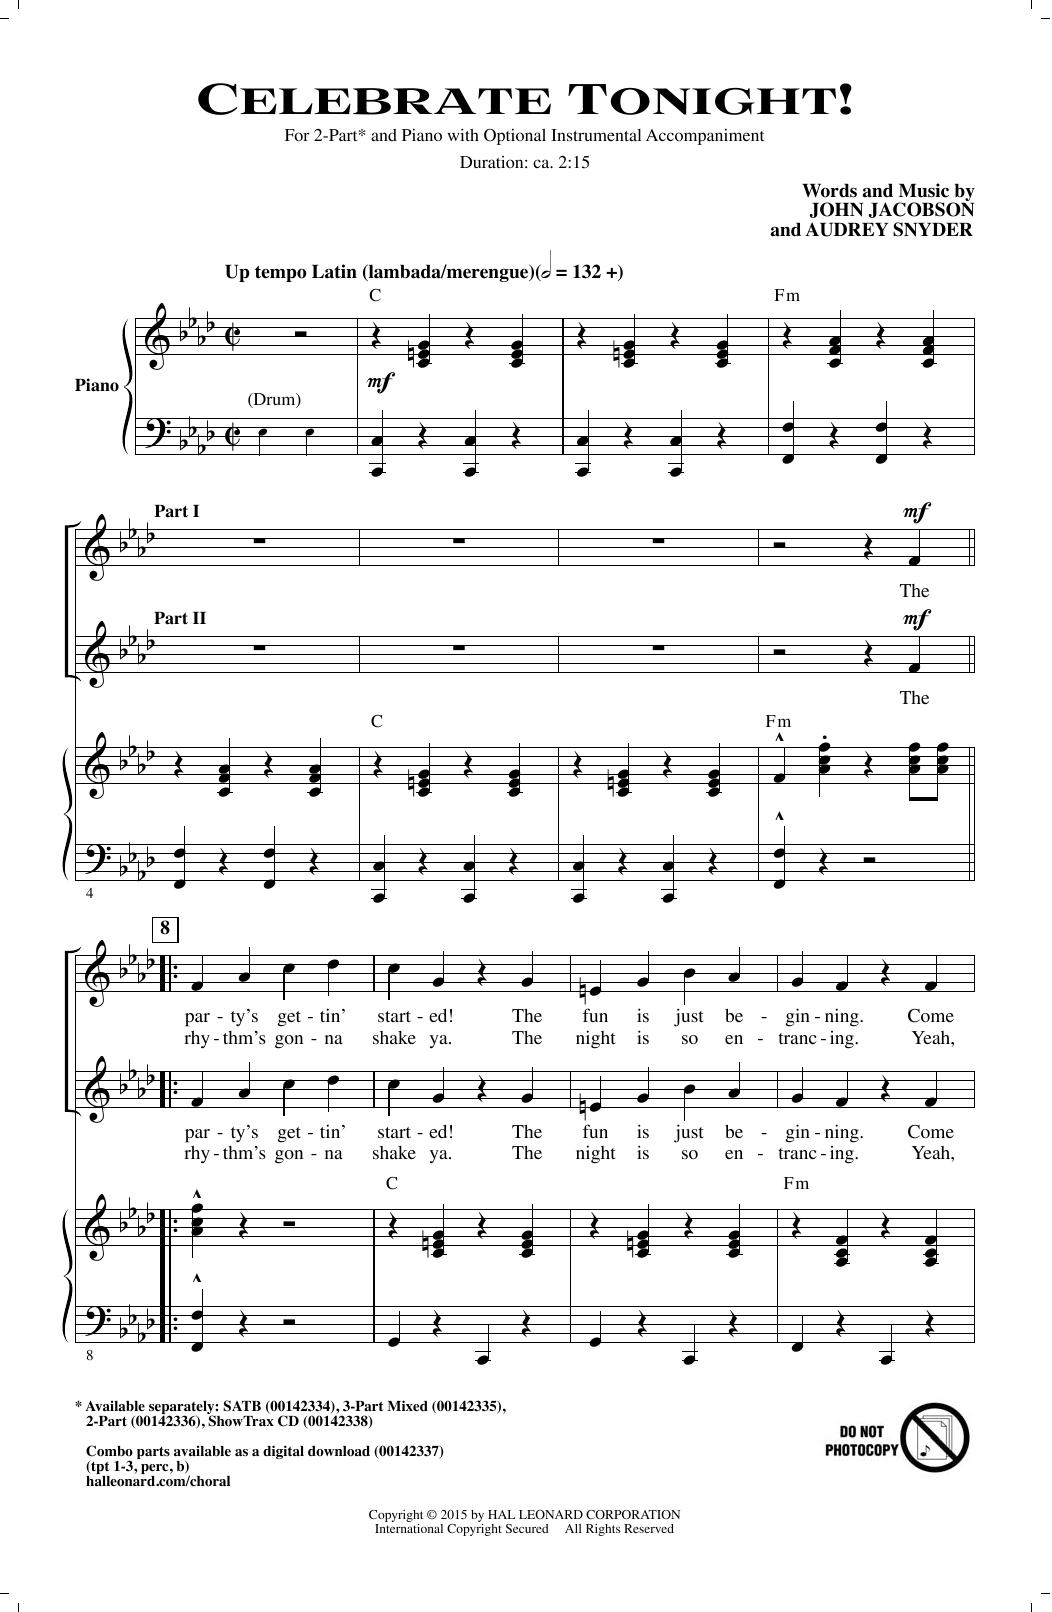 John Jacobson Celebrate Tonight! sheet music notes and chords. Download Printable PDF.